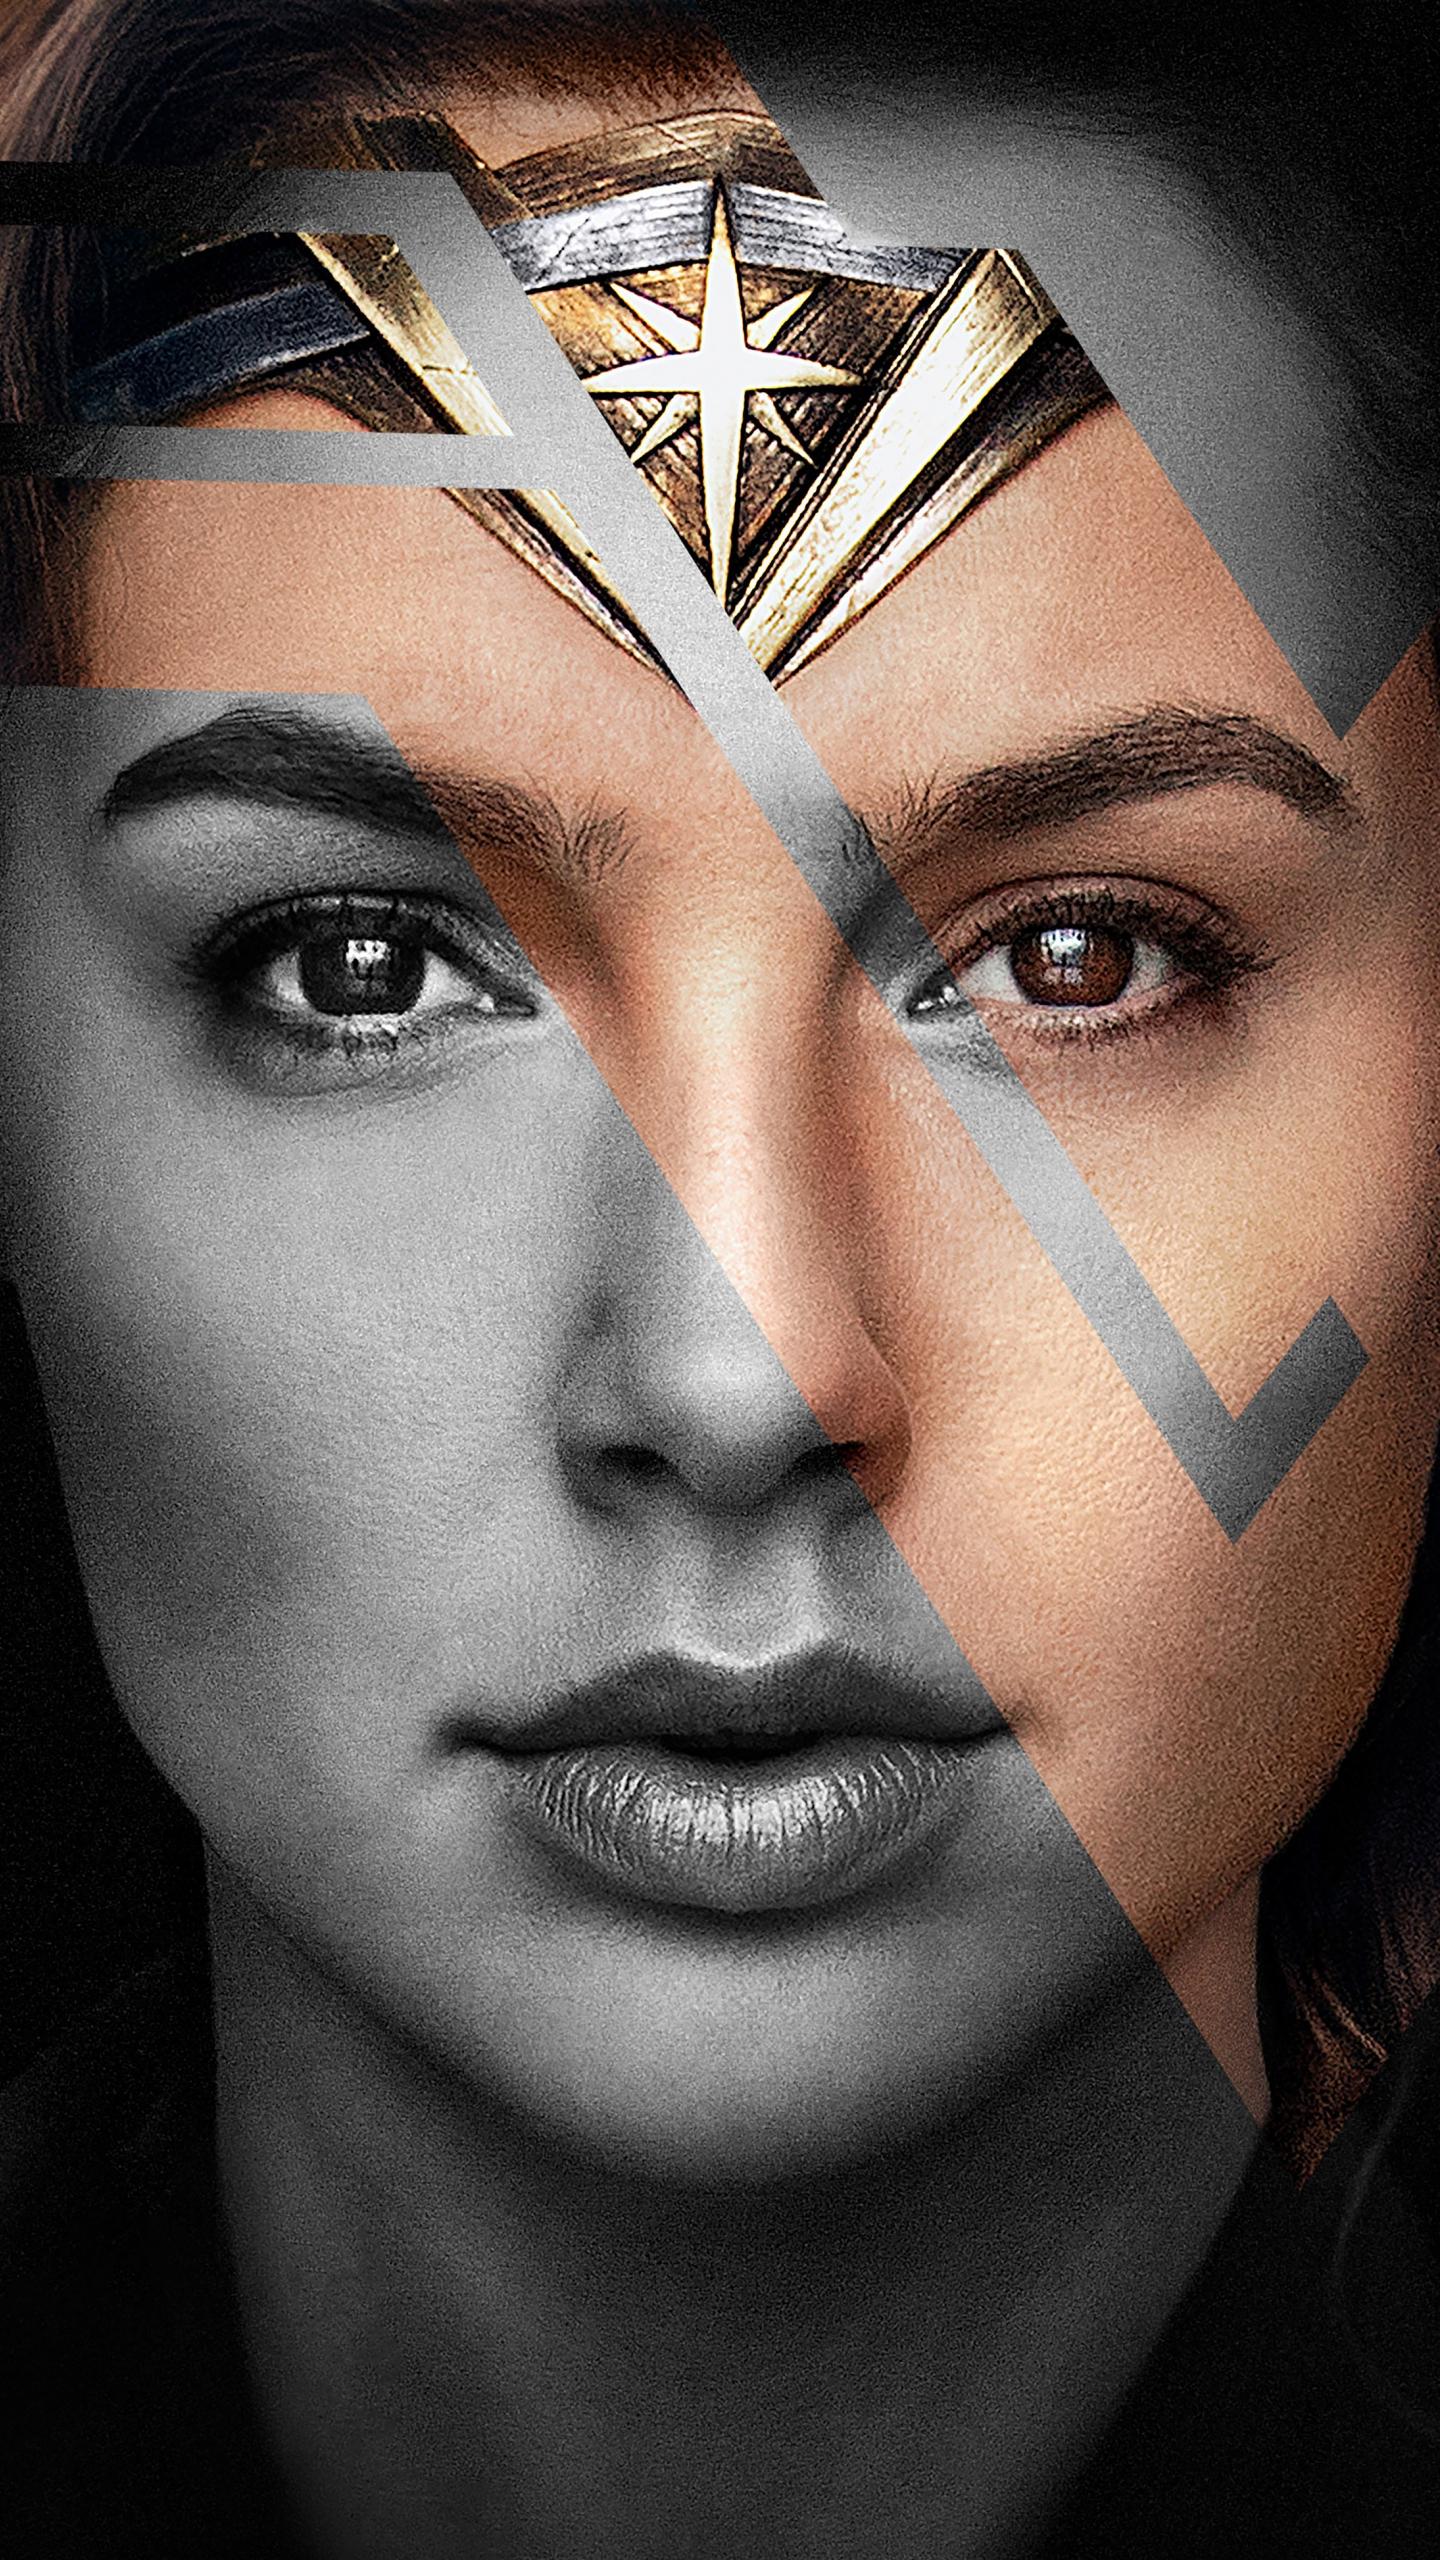 Wonder woman, gal gadot, justice league, actress, 1440x2560 wallpaper